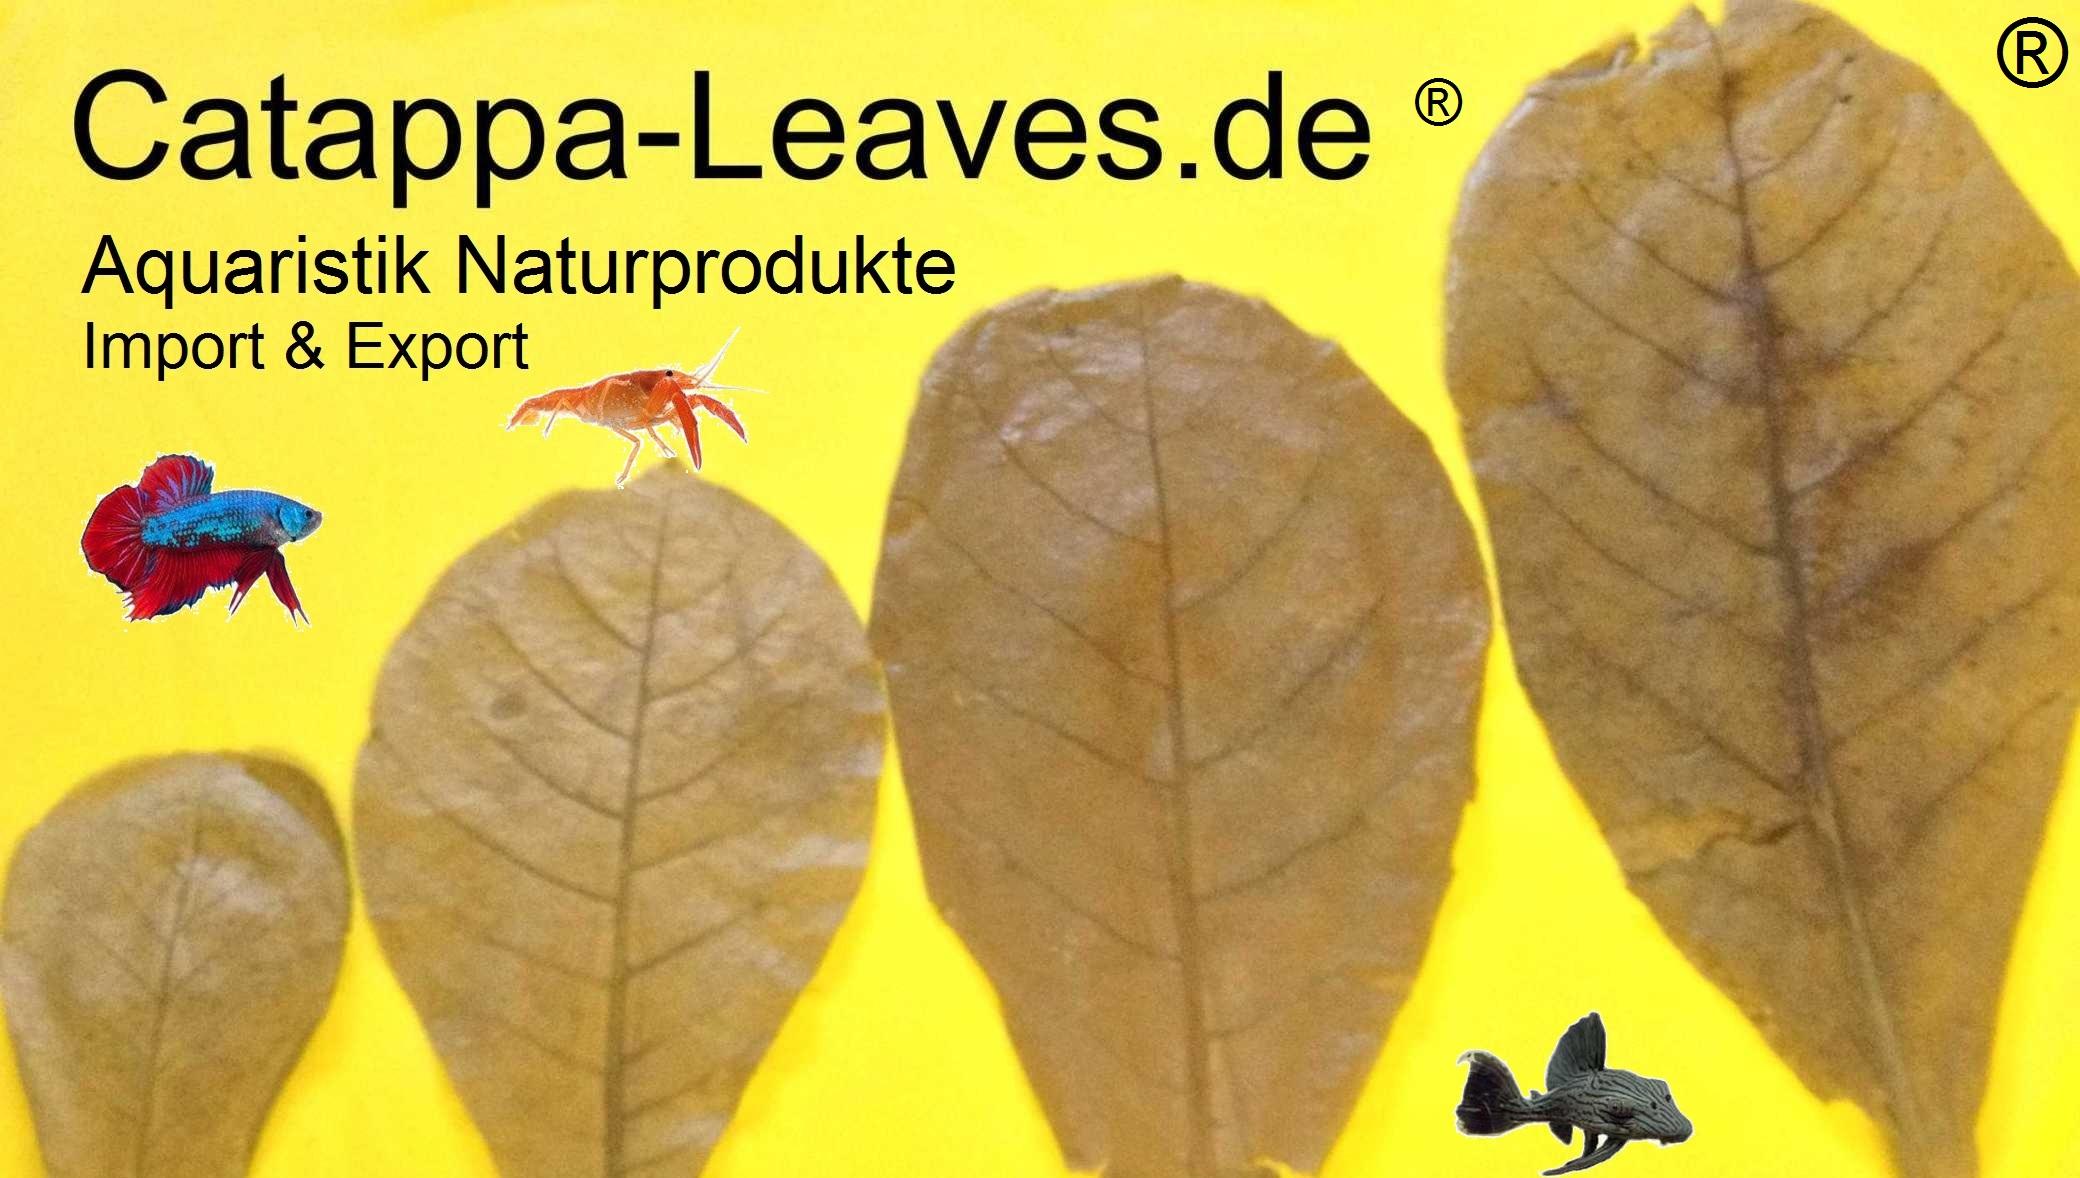 Catappa-Leaves Aquaristik Naturprodukte